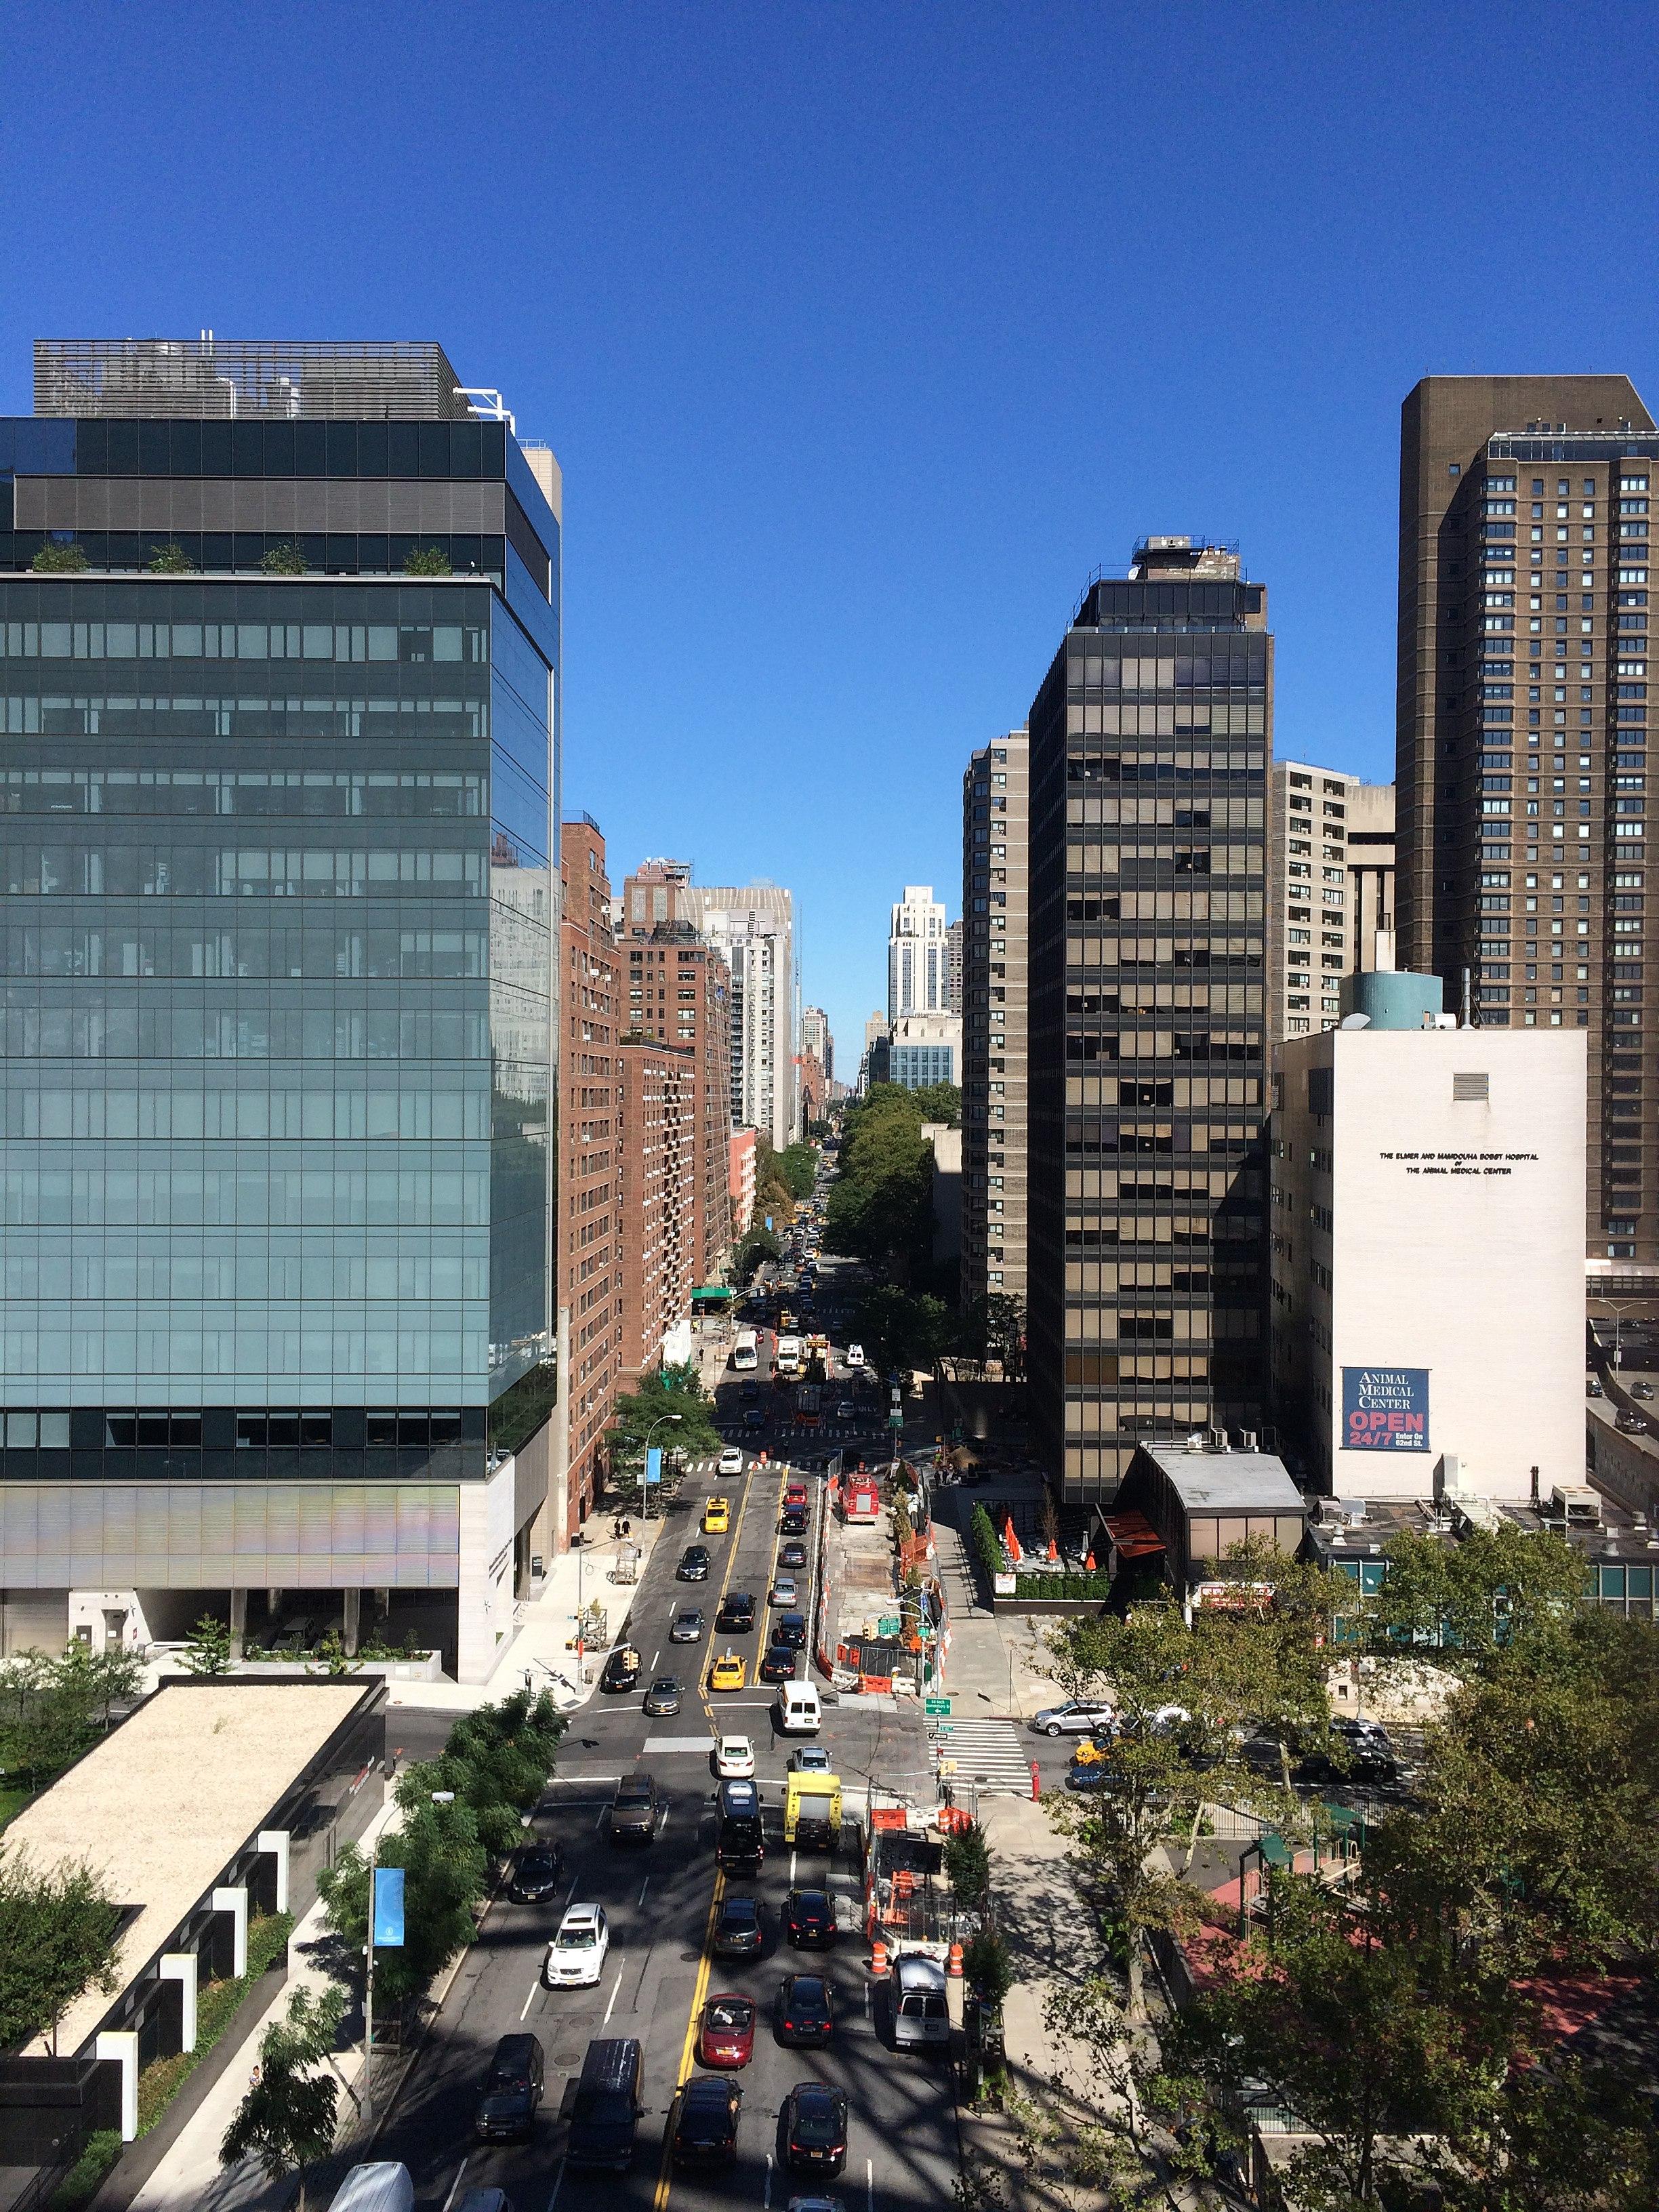 File:New York City - -i---i- (29831097012) jpg - Wikimedia